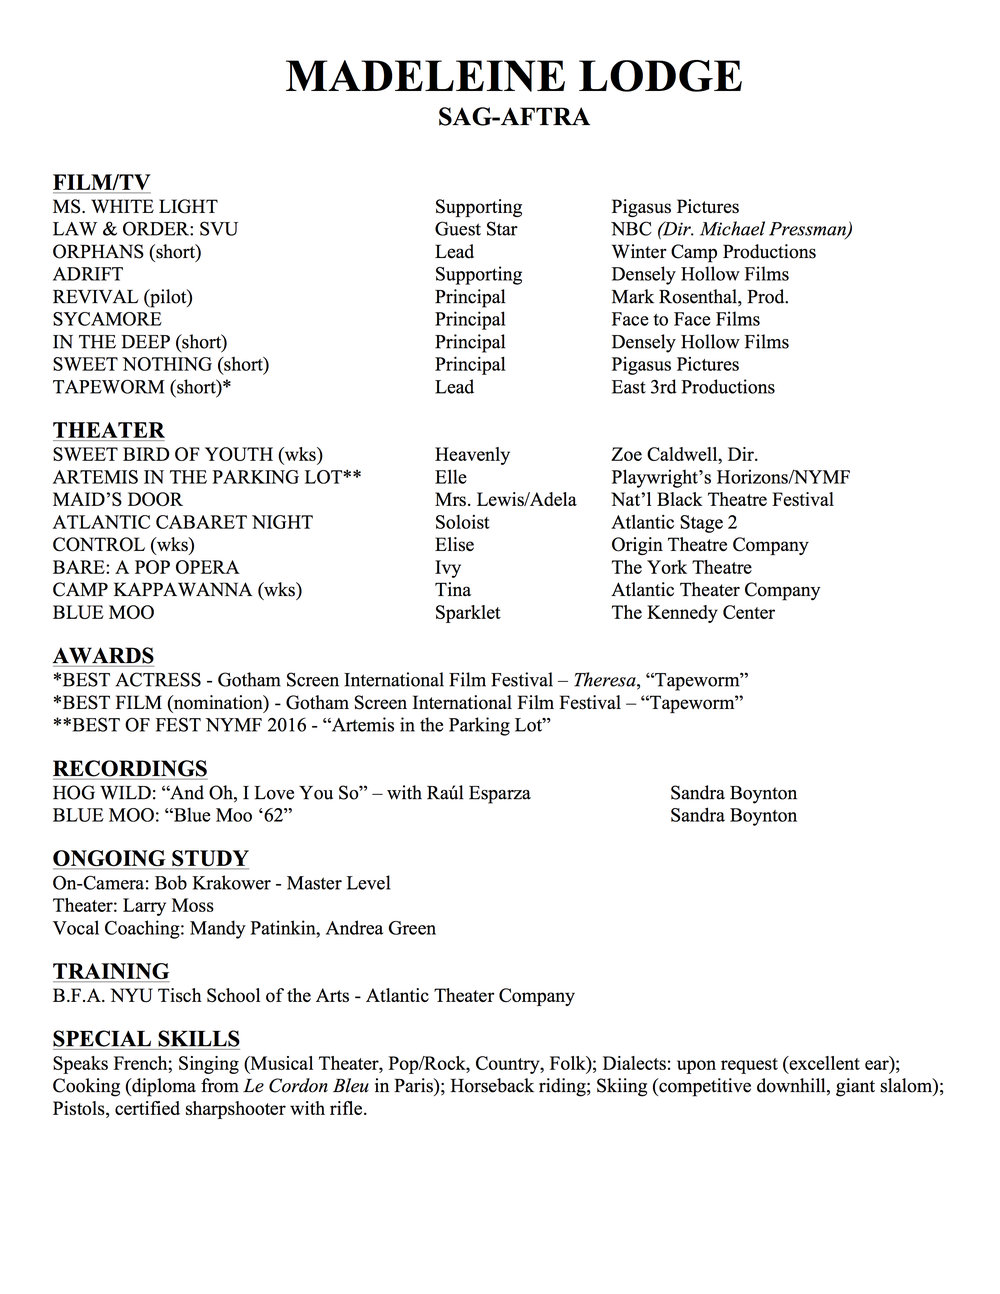 Resume — MADELEINE LODGE